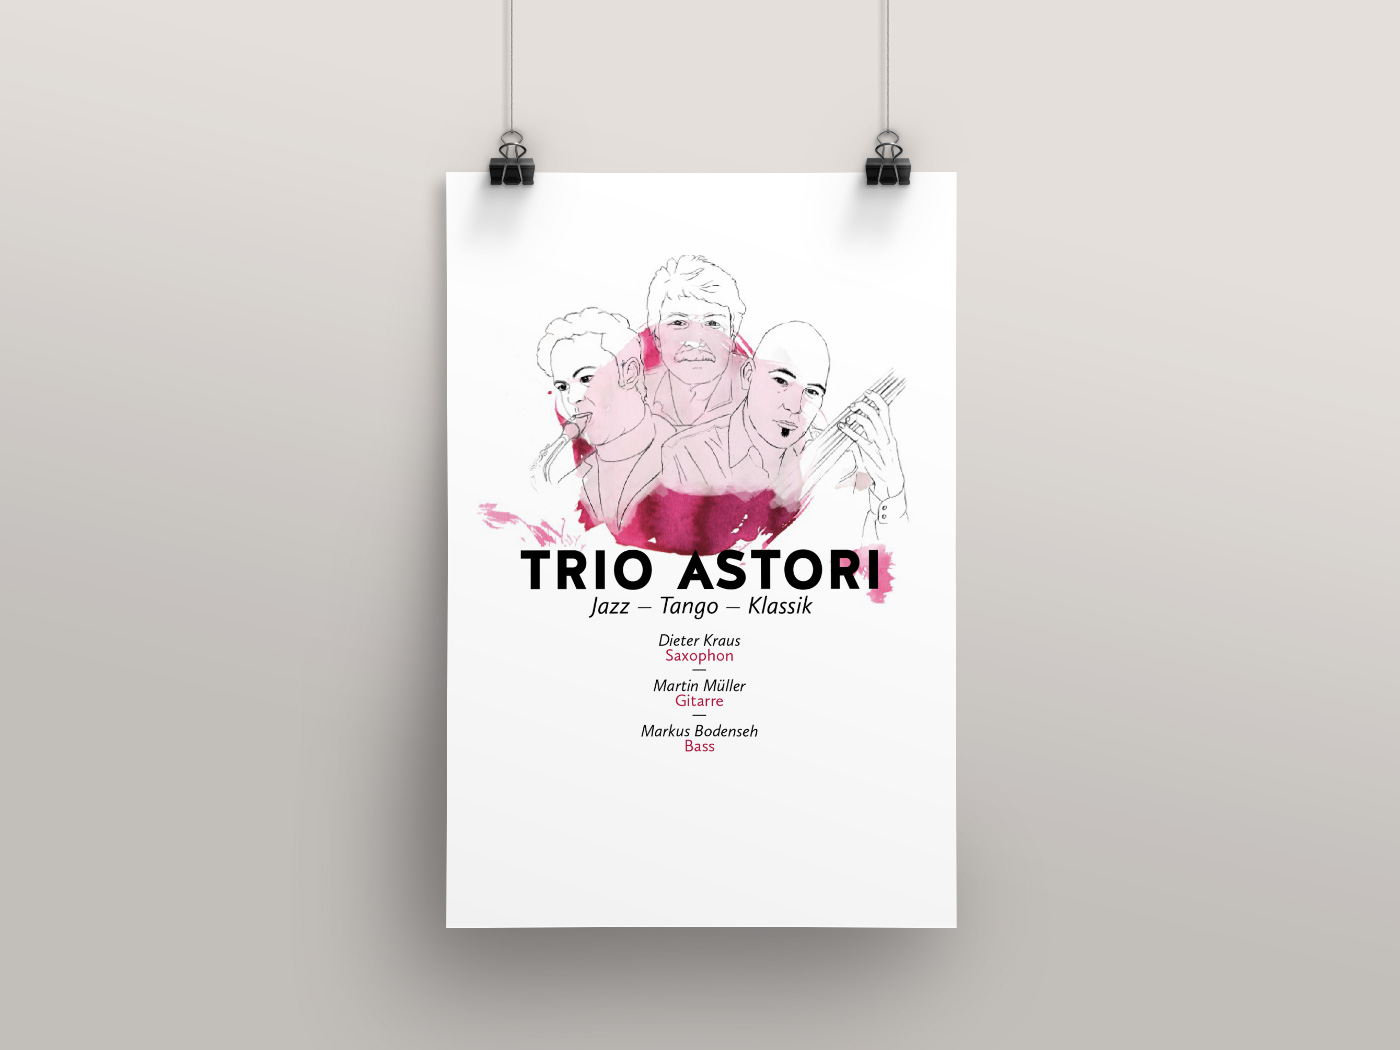 trio-astori_artwork_poster_grafik_design_marina_marina_db_augsburg